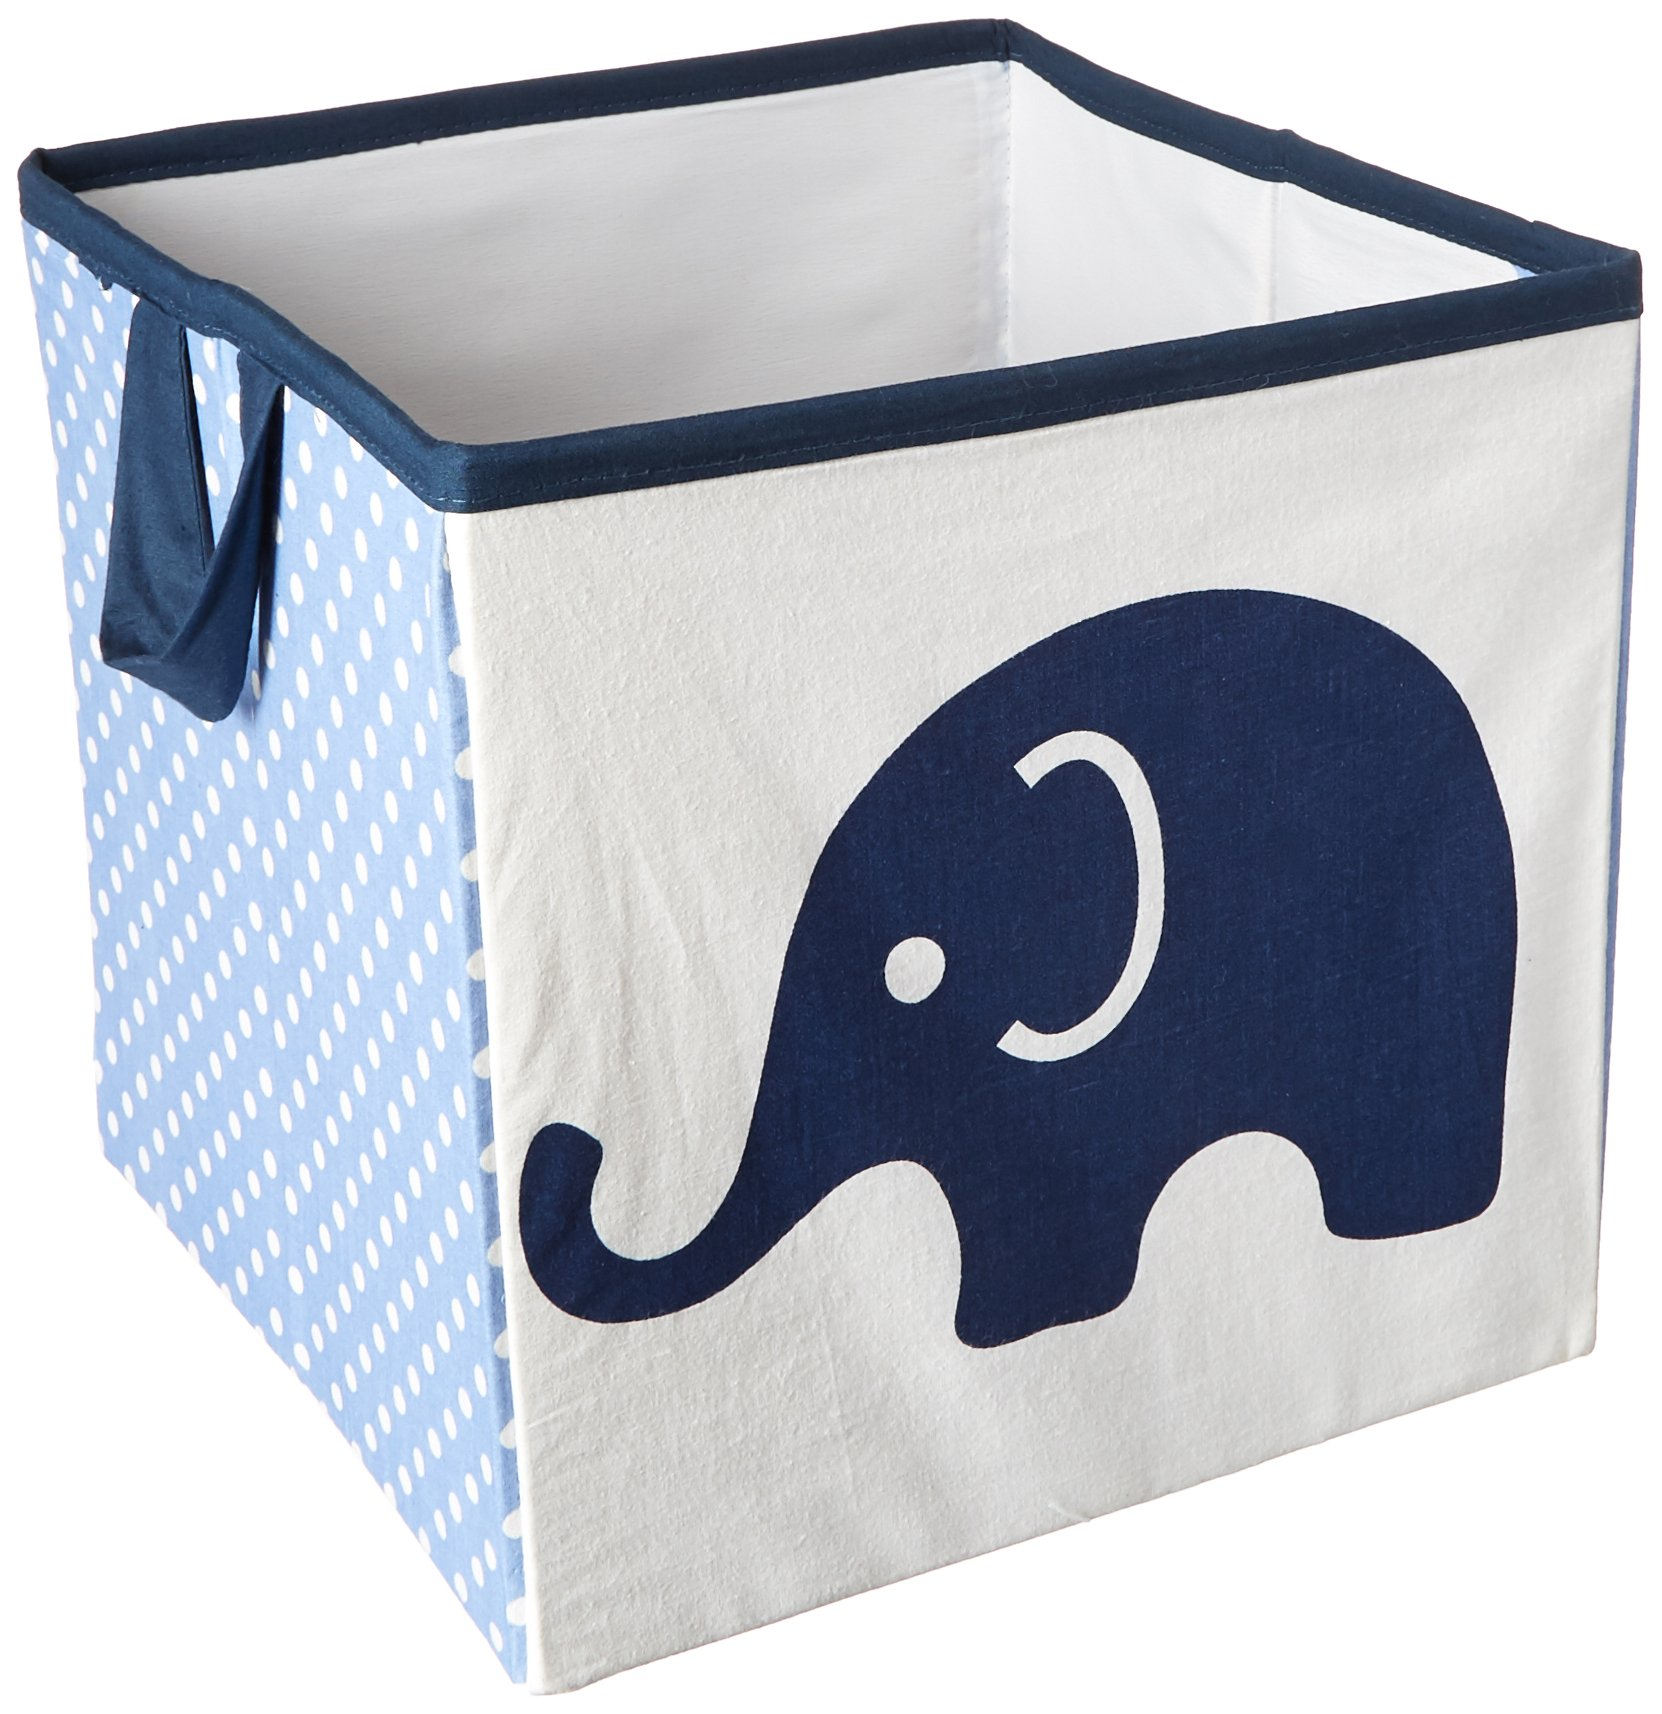 Bacati Elephants Storage Tote Basket, Blue/Grey, Small